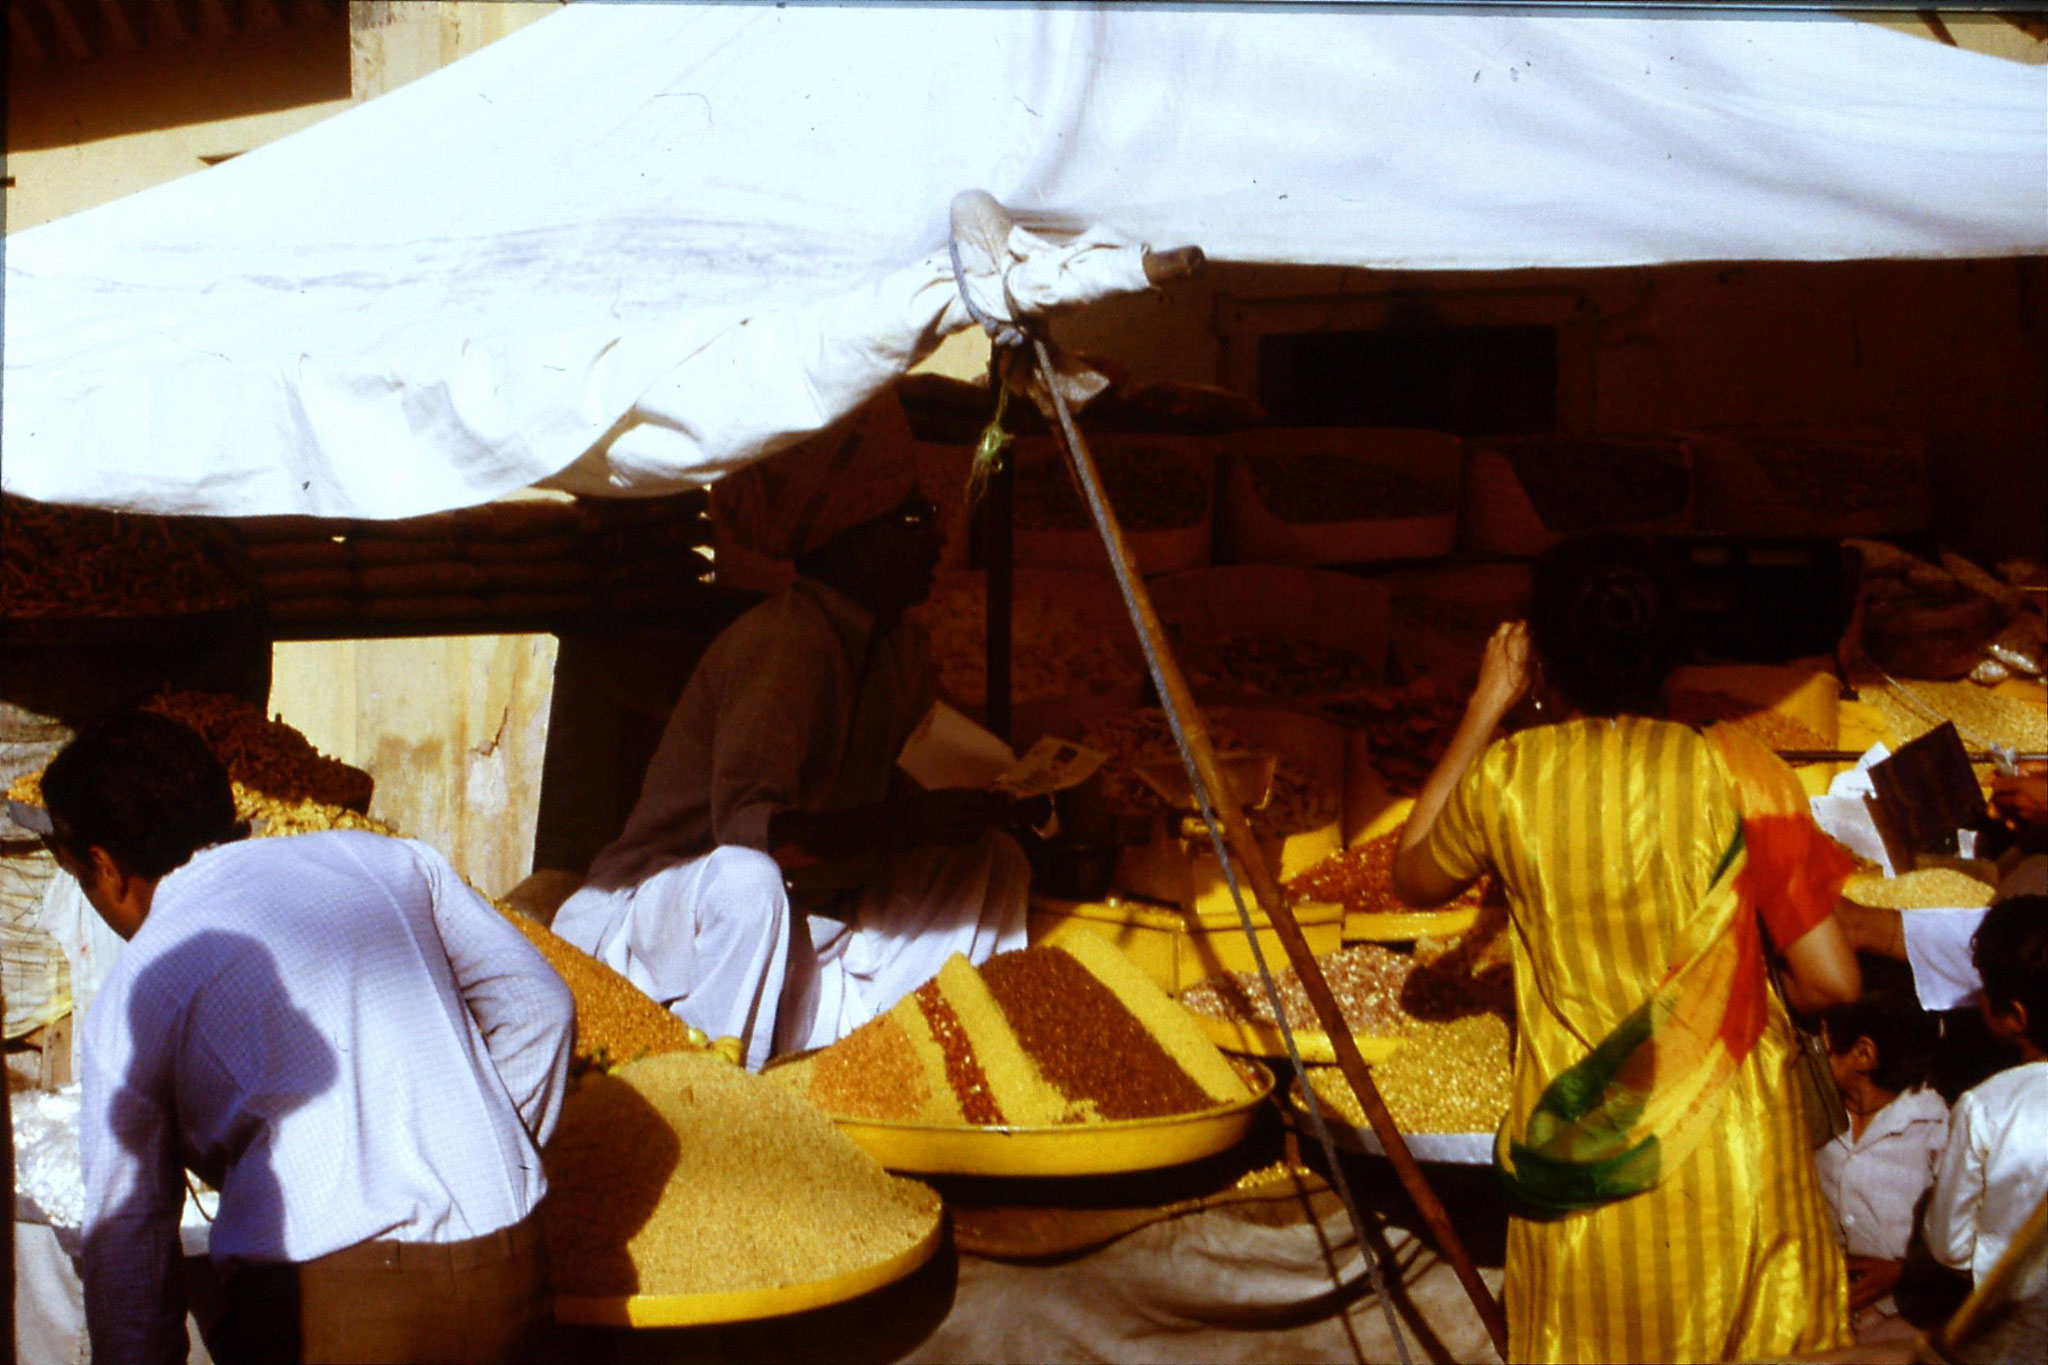 109/22: 3/4/1990 Jaipur/Amber - sweet stall